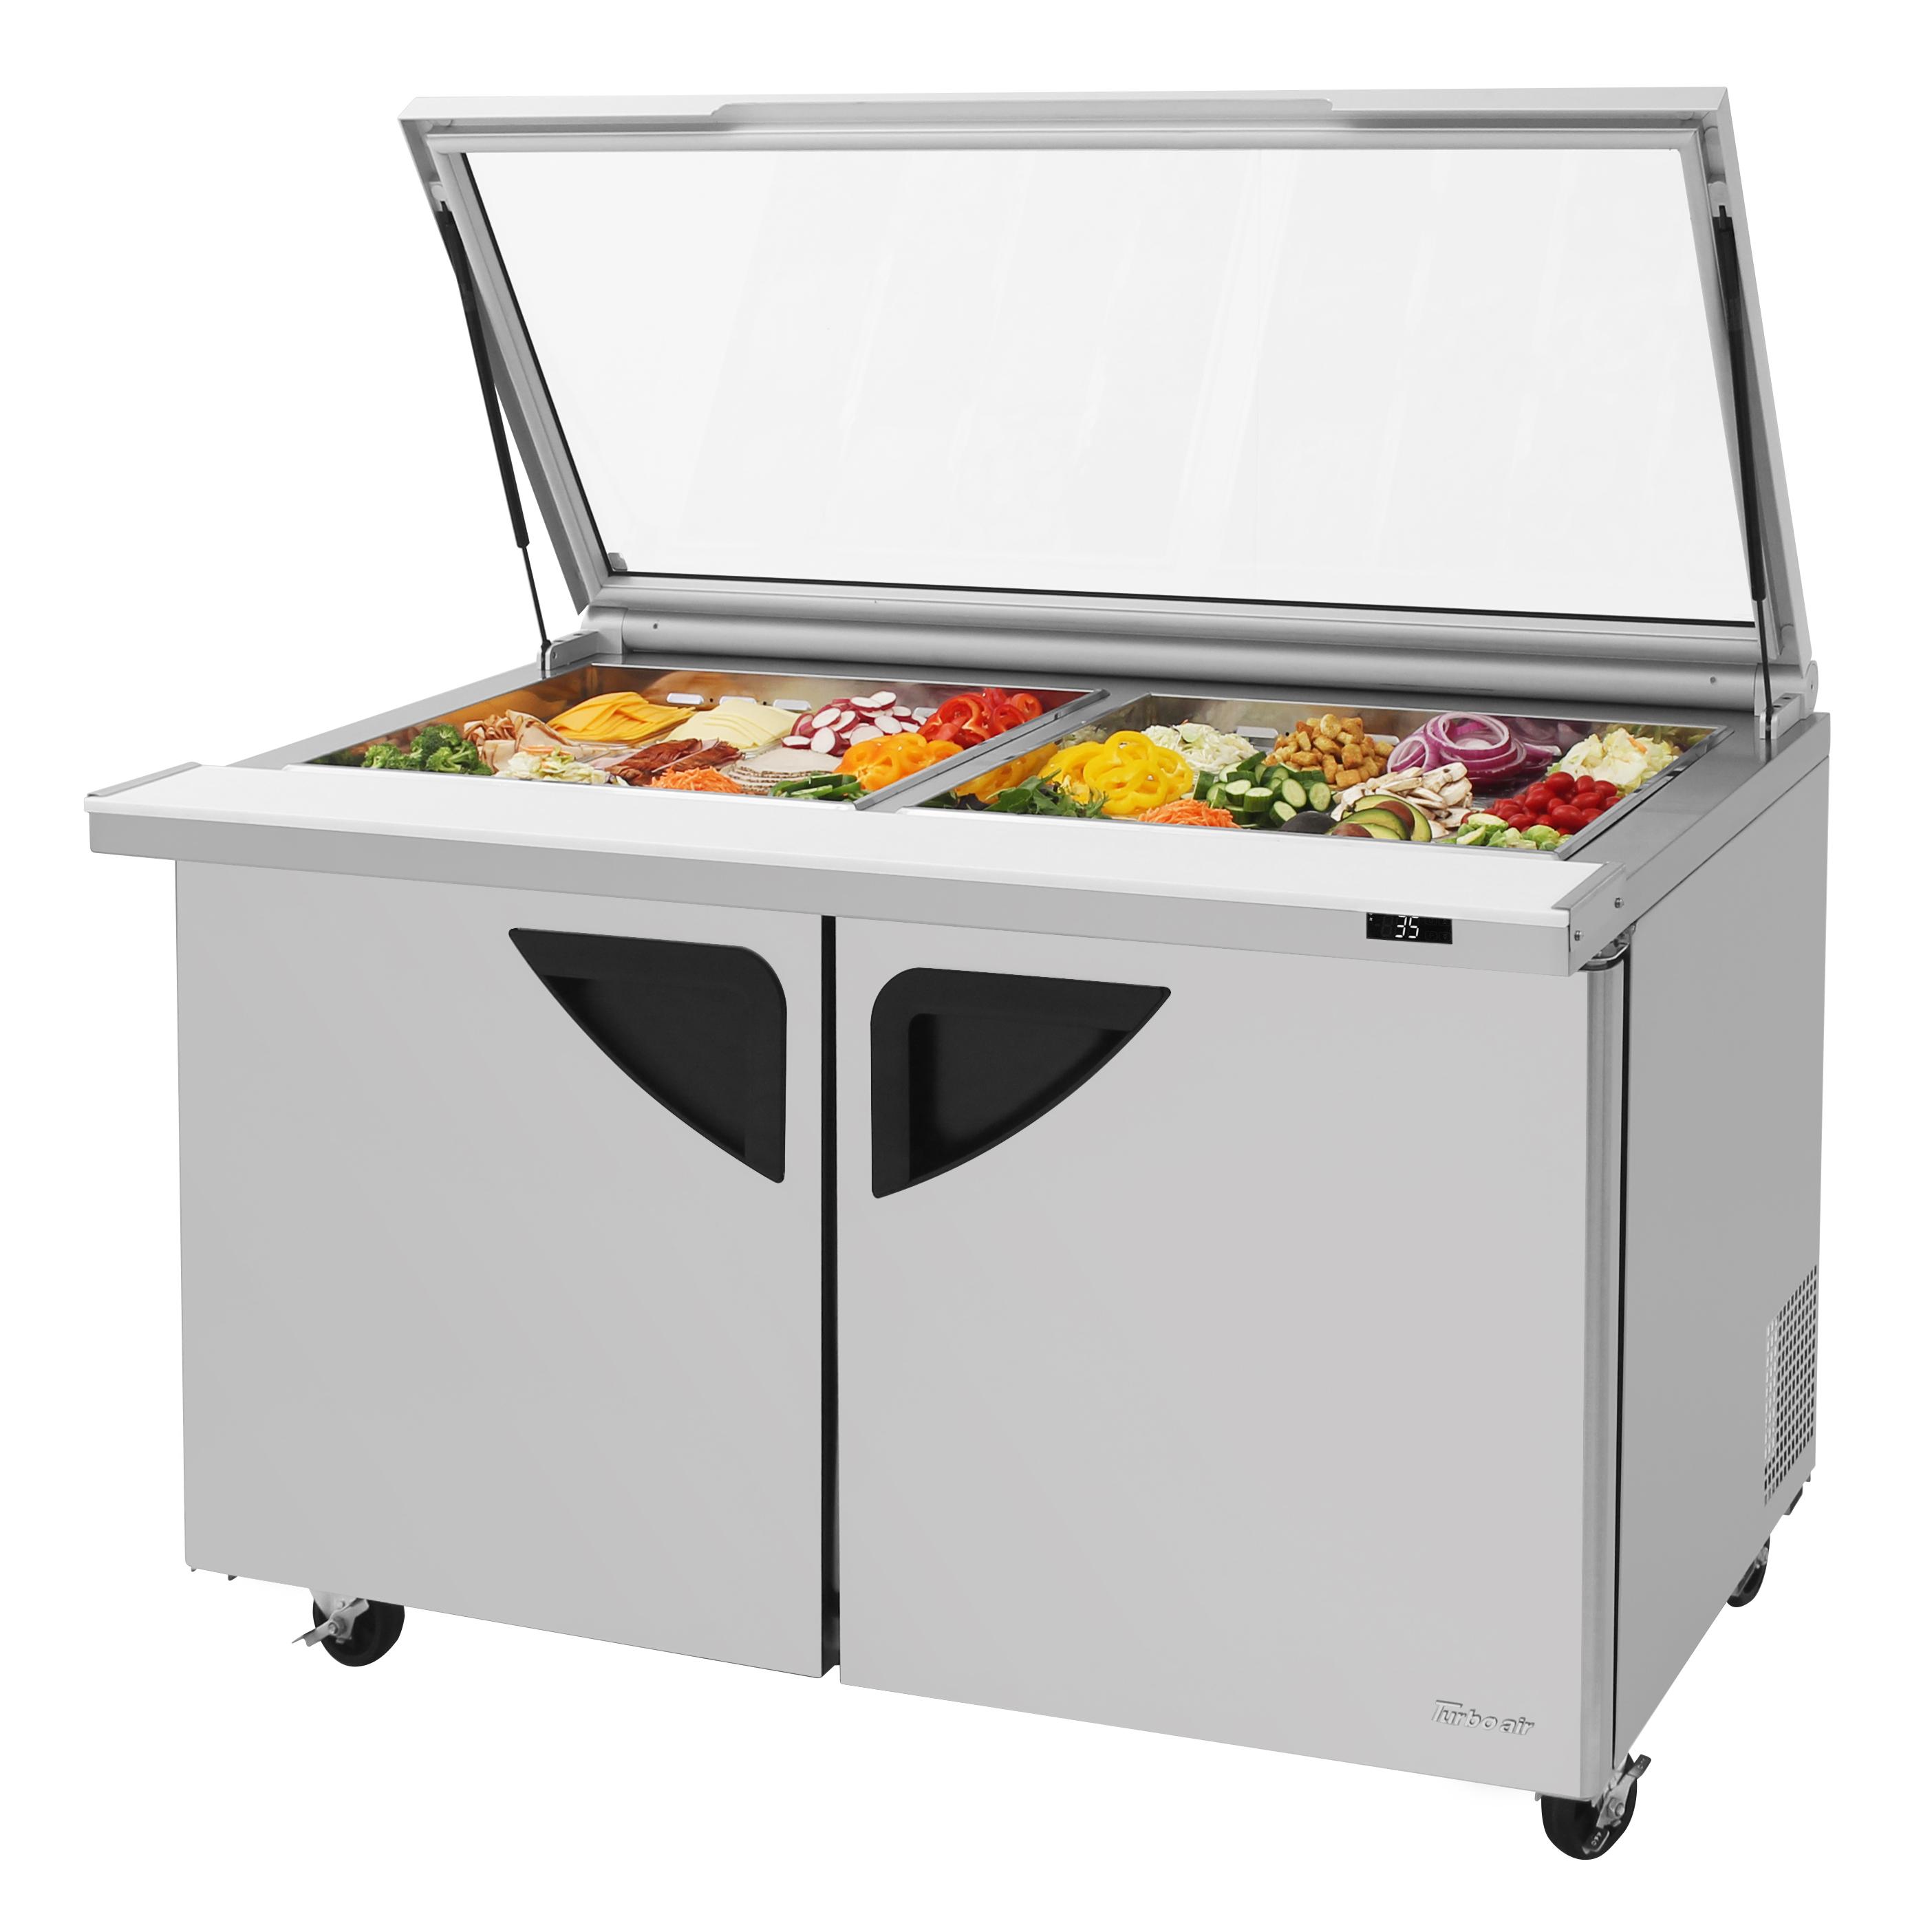 Turbo Air TST-60SD-24-N-GL refrigerated counter, mega top sandwich / salad unit